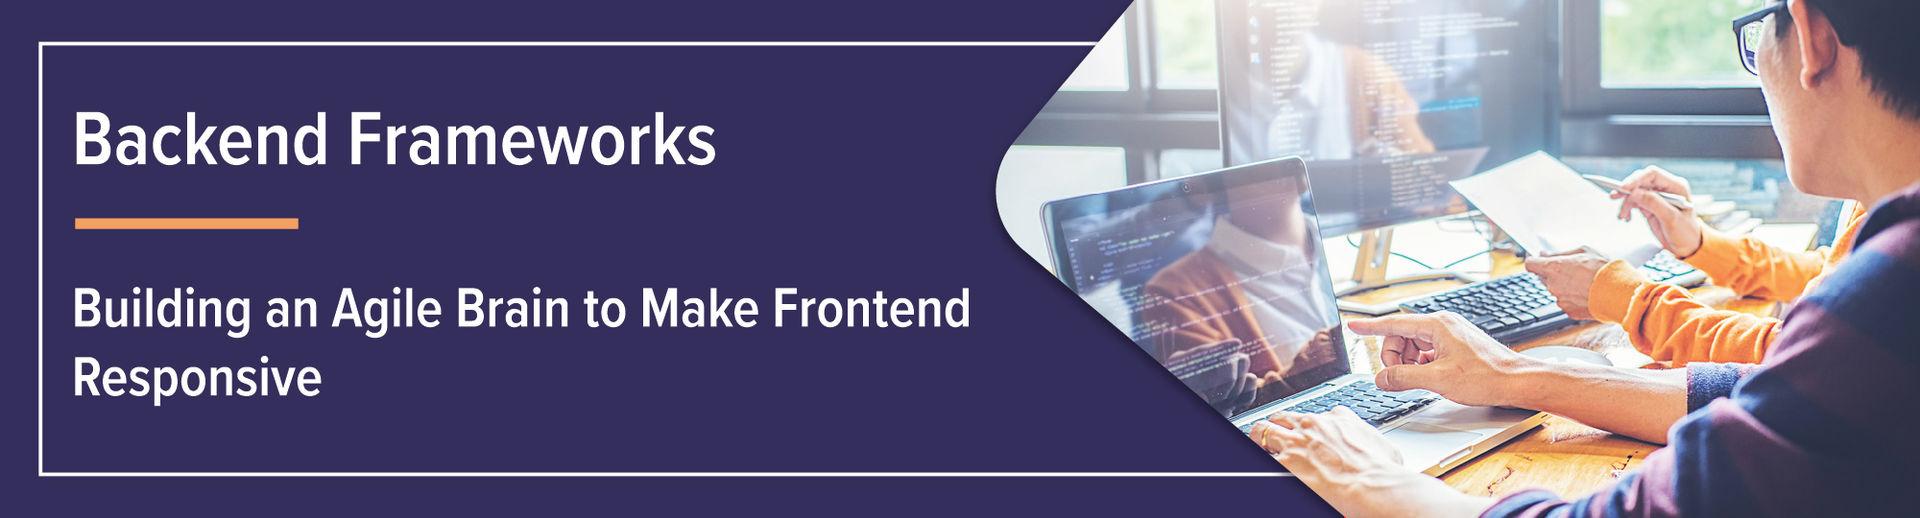 Top 7 Backend Web Development Frameworks 2019